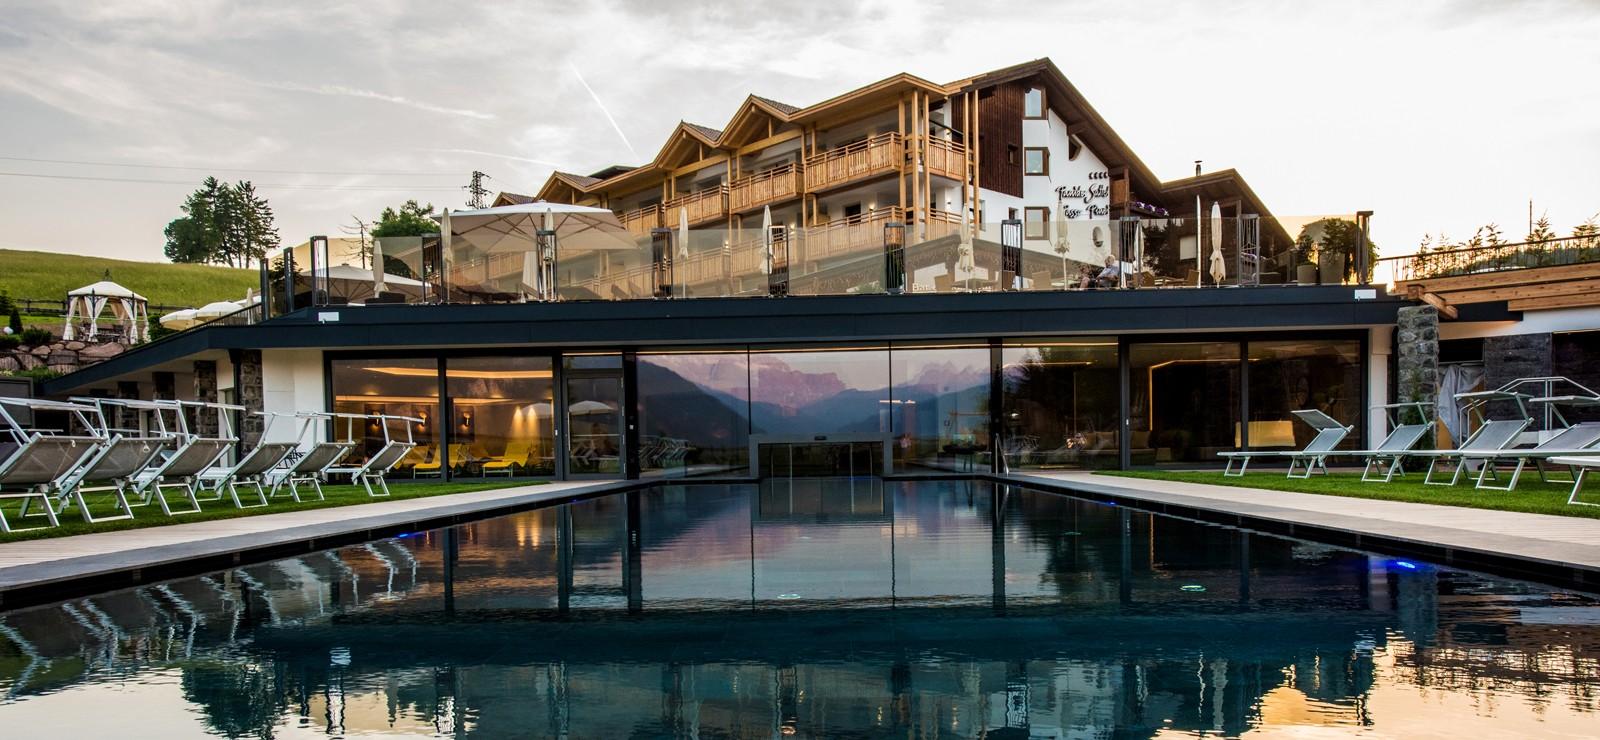 Hotel Pinei Nature & Spirit Bilder   Bild 1